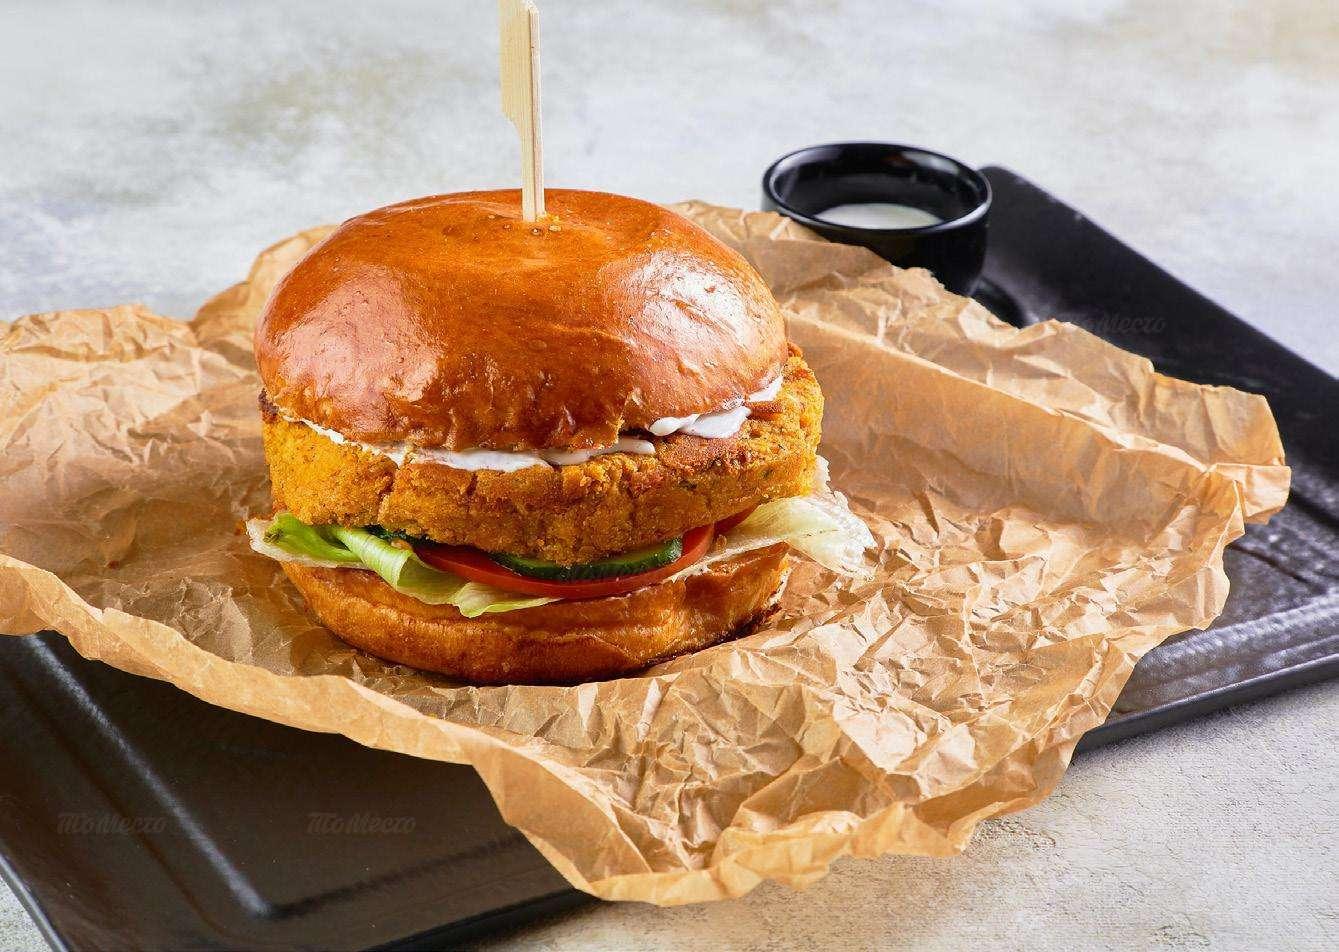 Скидка 20% на блюда при заказе навынос